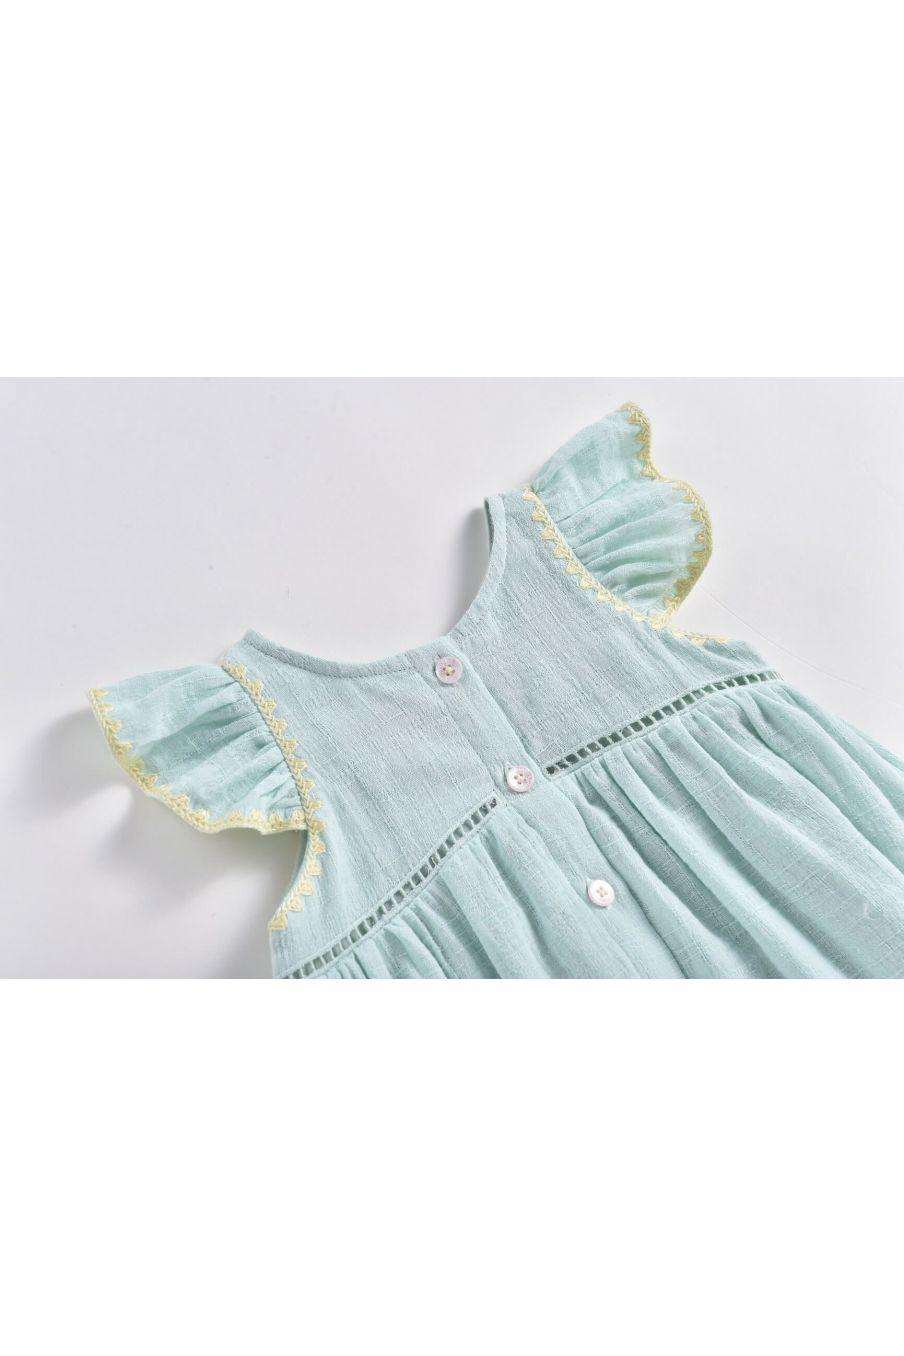 boheme chic vintage robe bébé fille jendahiu amande